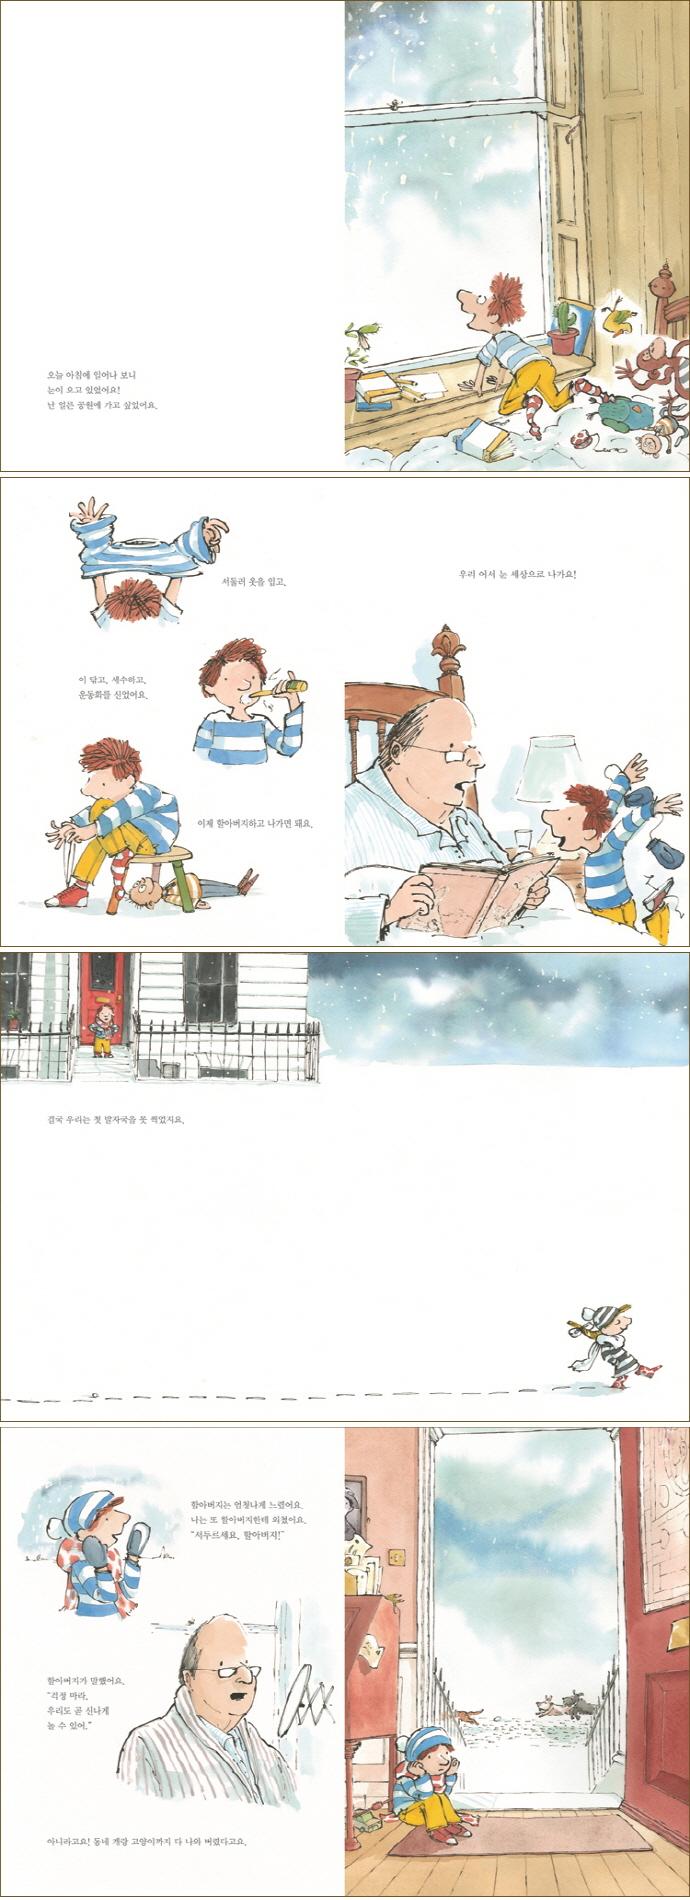 Snow(스노우)(베스트 세계 걸작 그림책)(양장본 HardCover) 도서 상세이미지